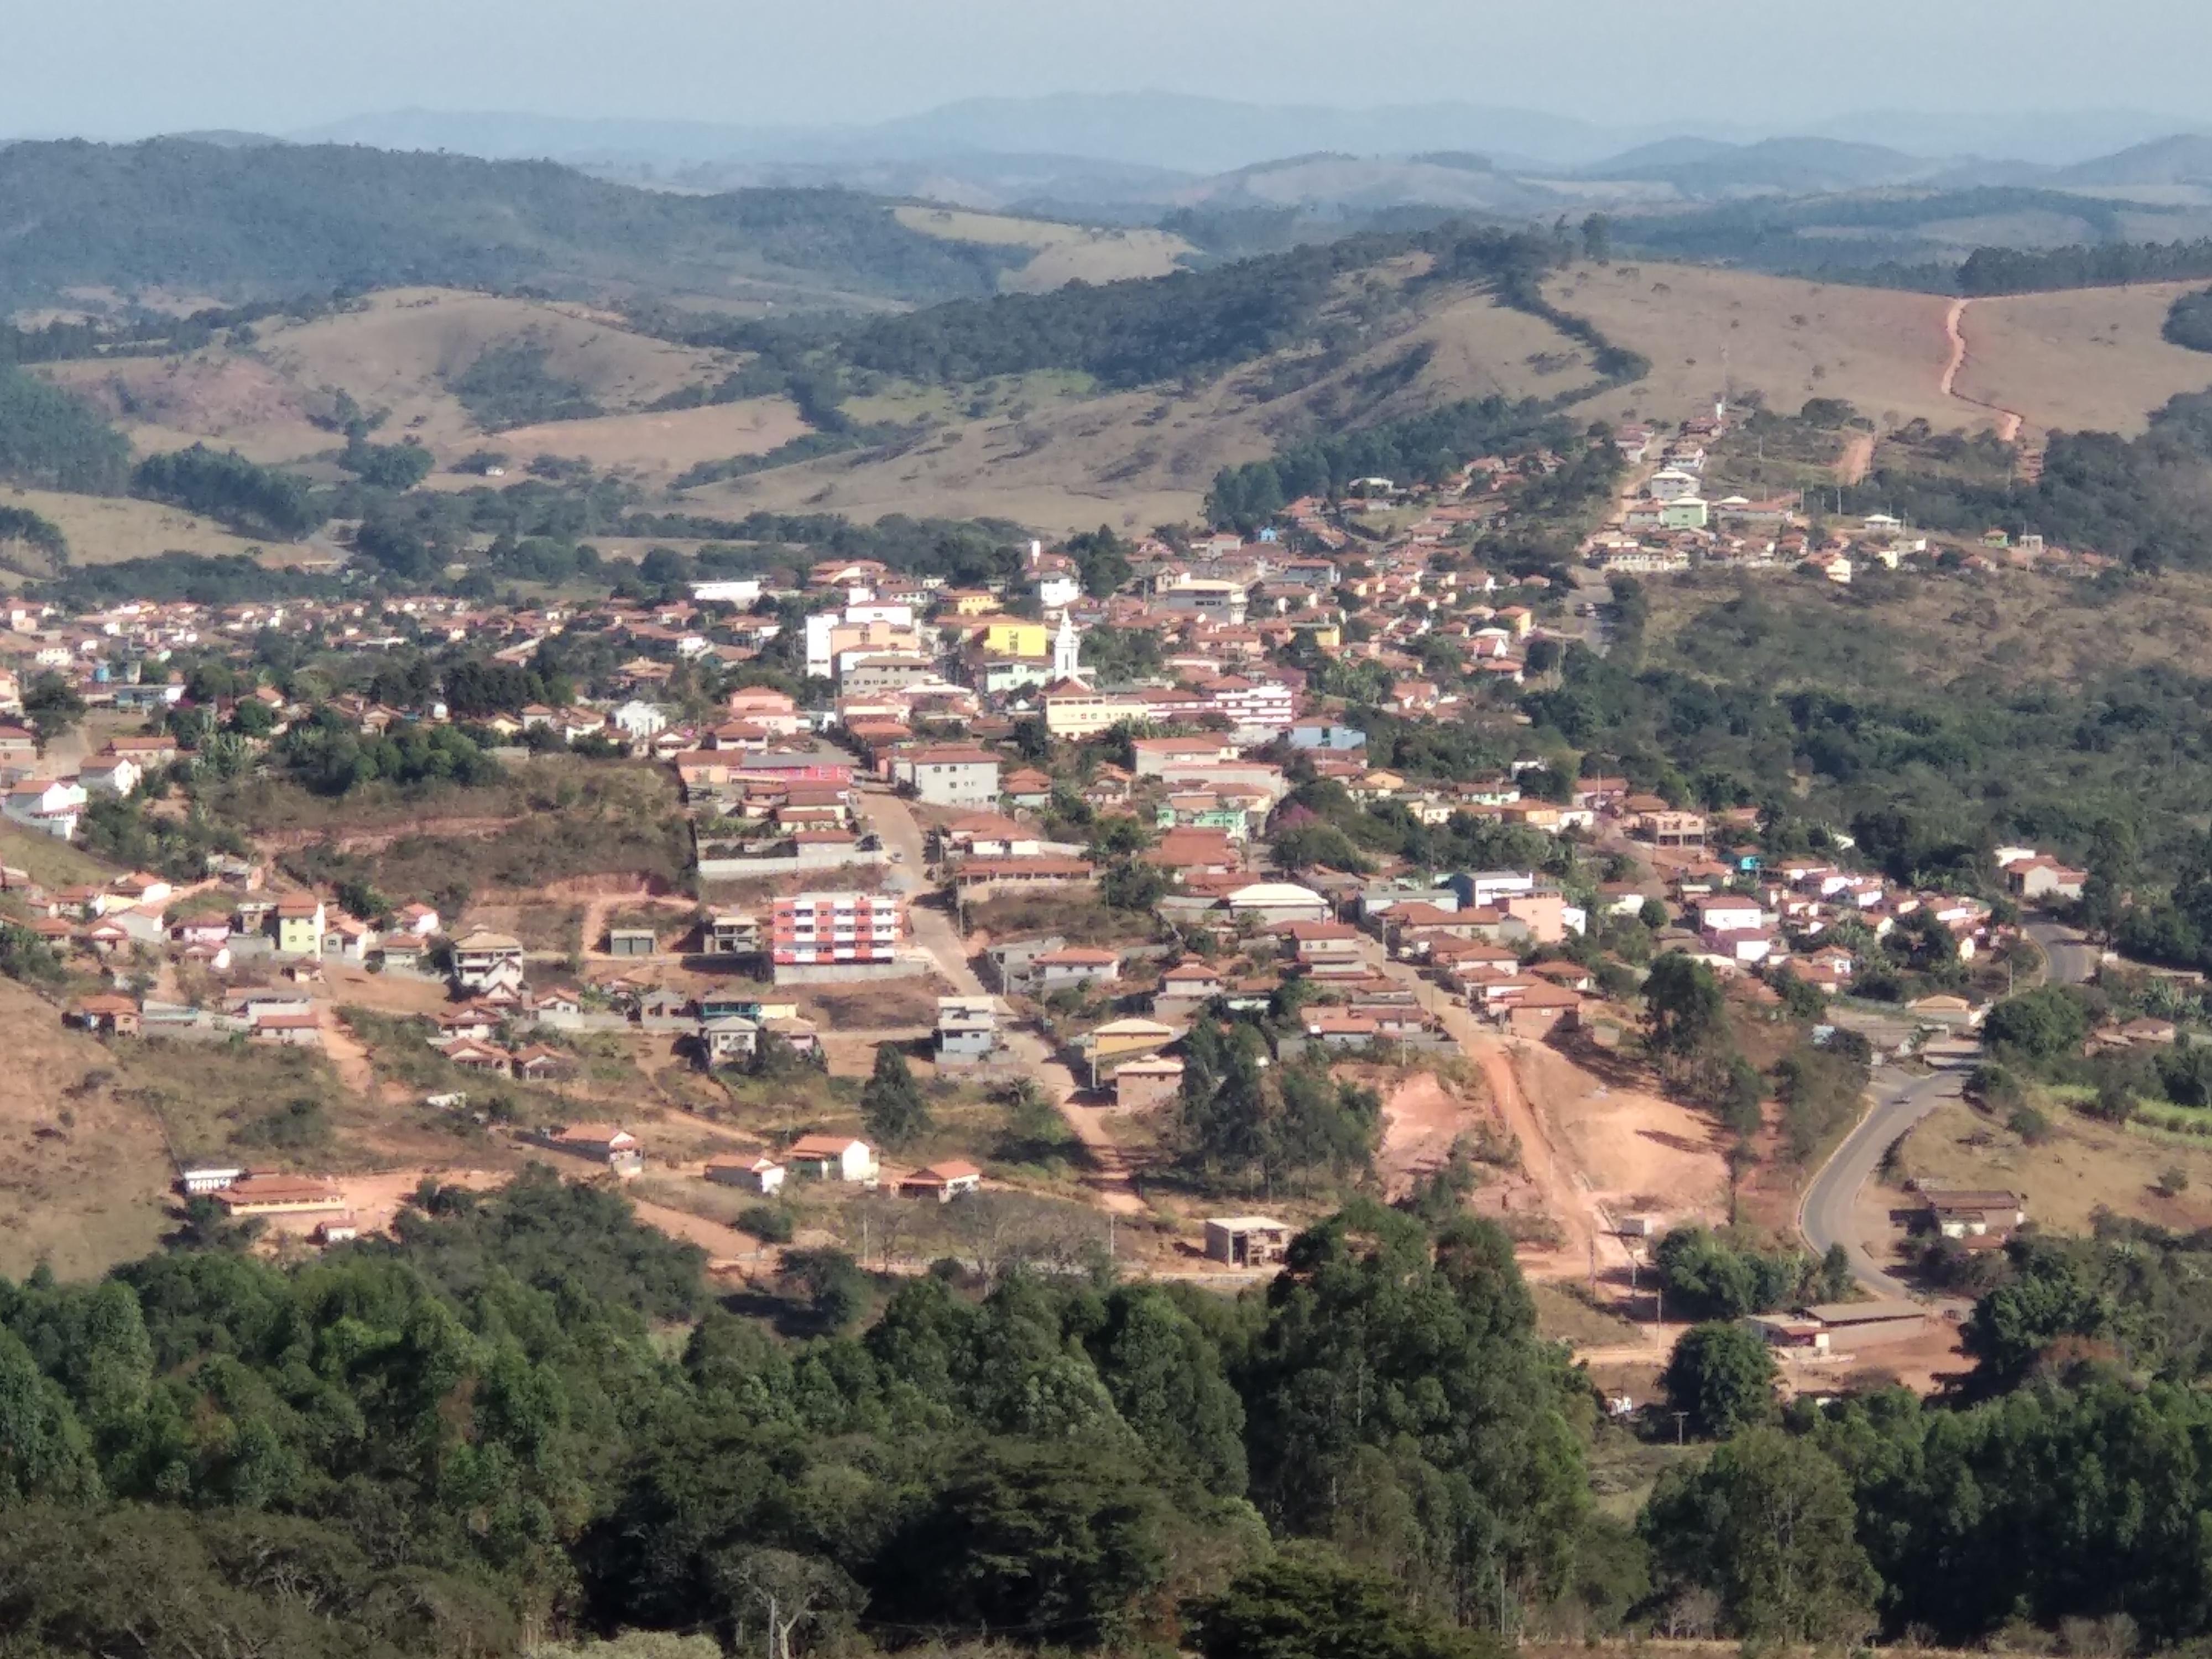 Desterro de Entre Rios Minas Gerais fonte: registrodemarca.arenamarcas.com.br